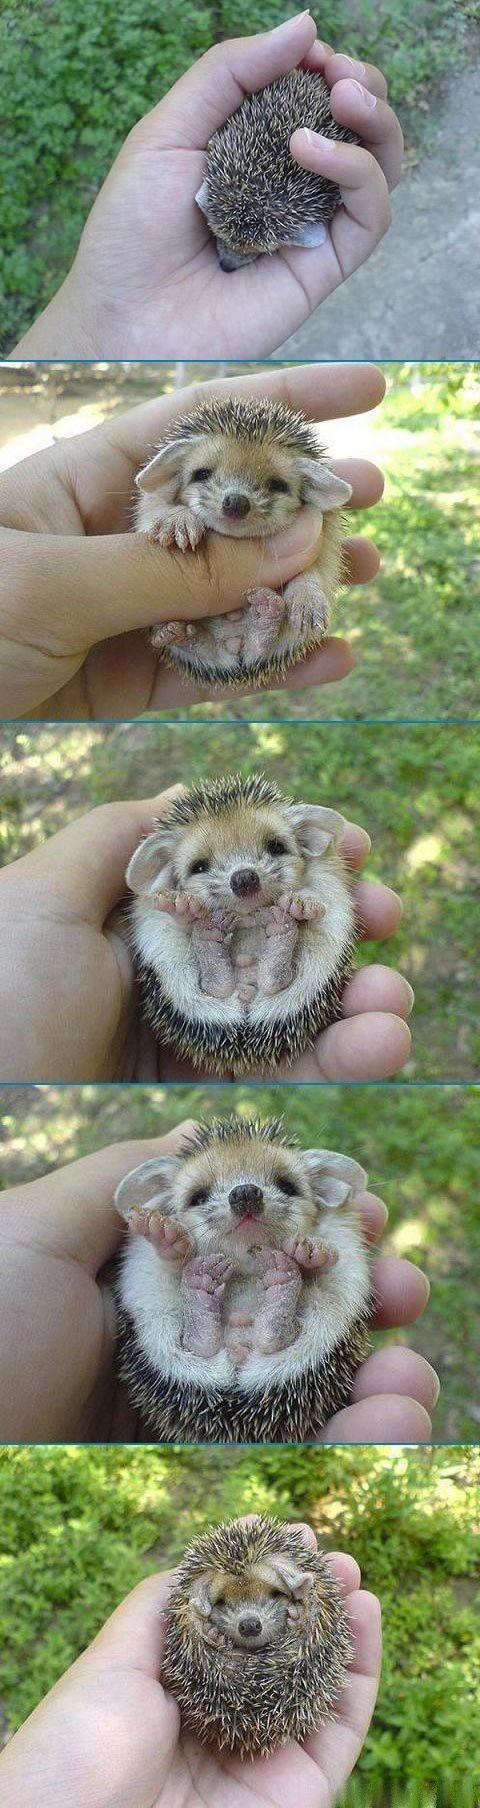 Holy cute!